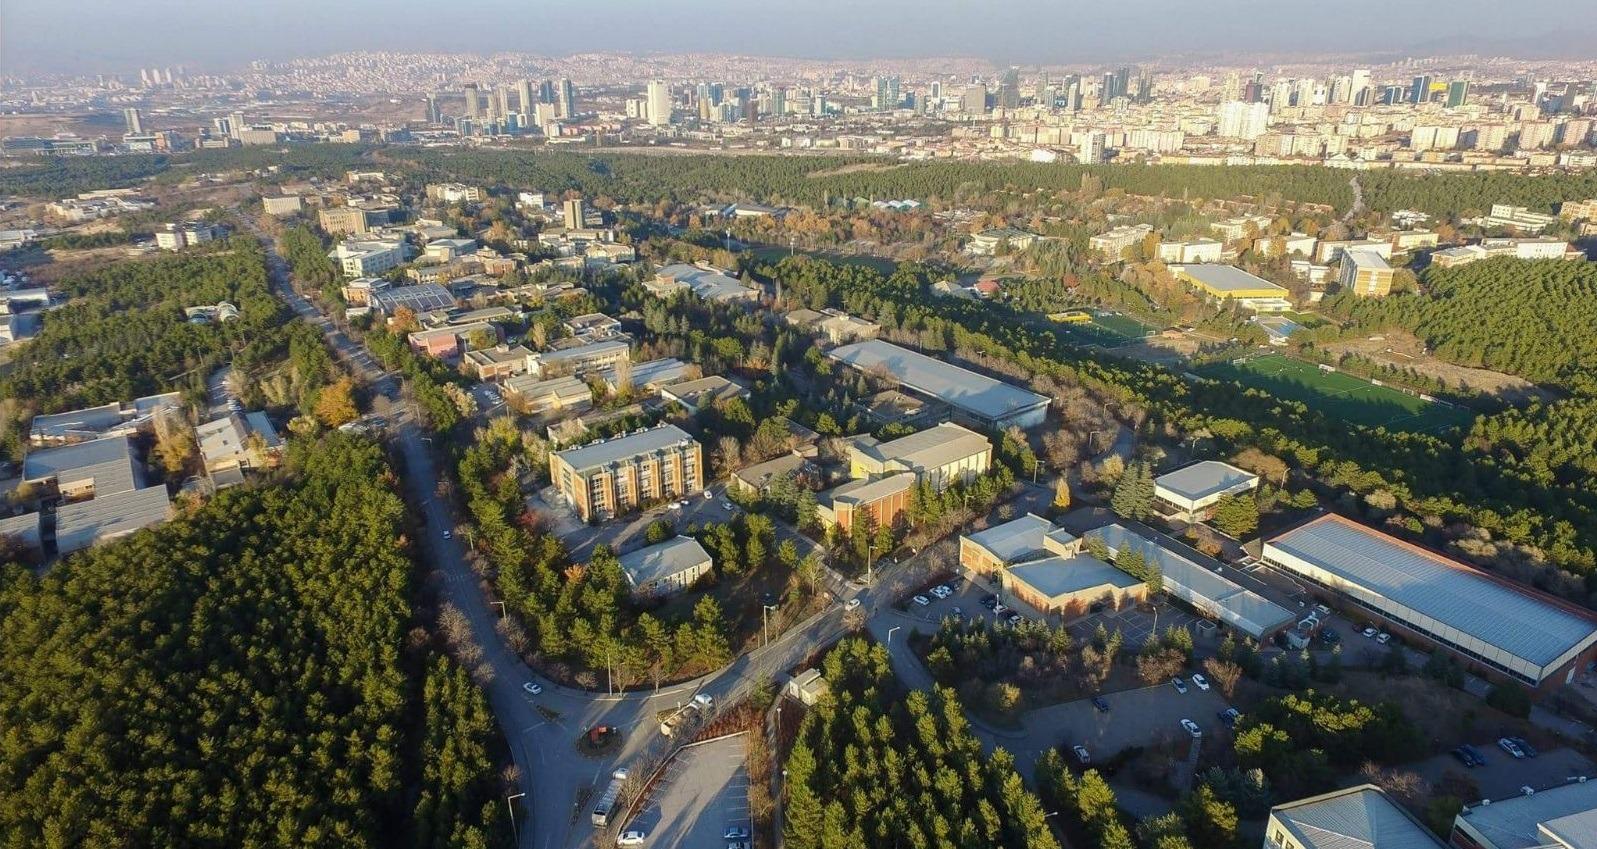 METU (Middle East Technical University) Campus.